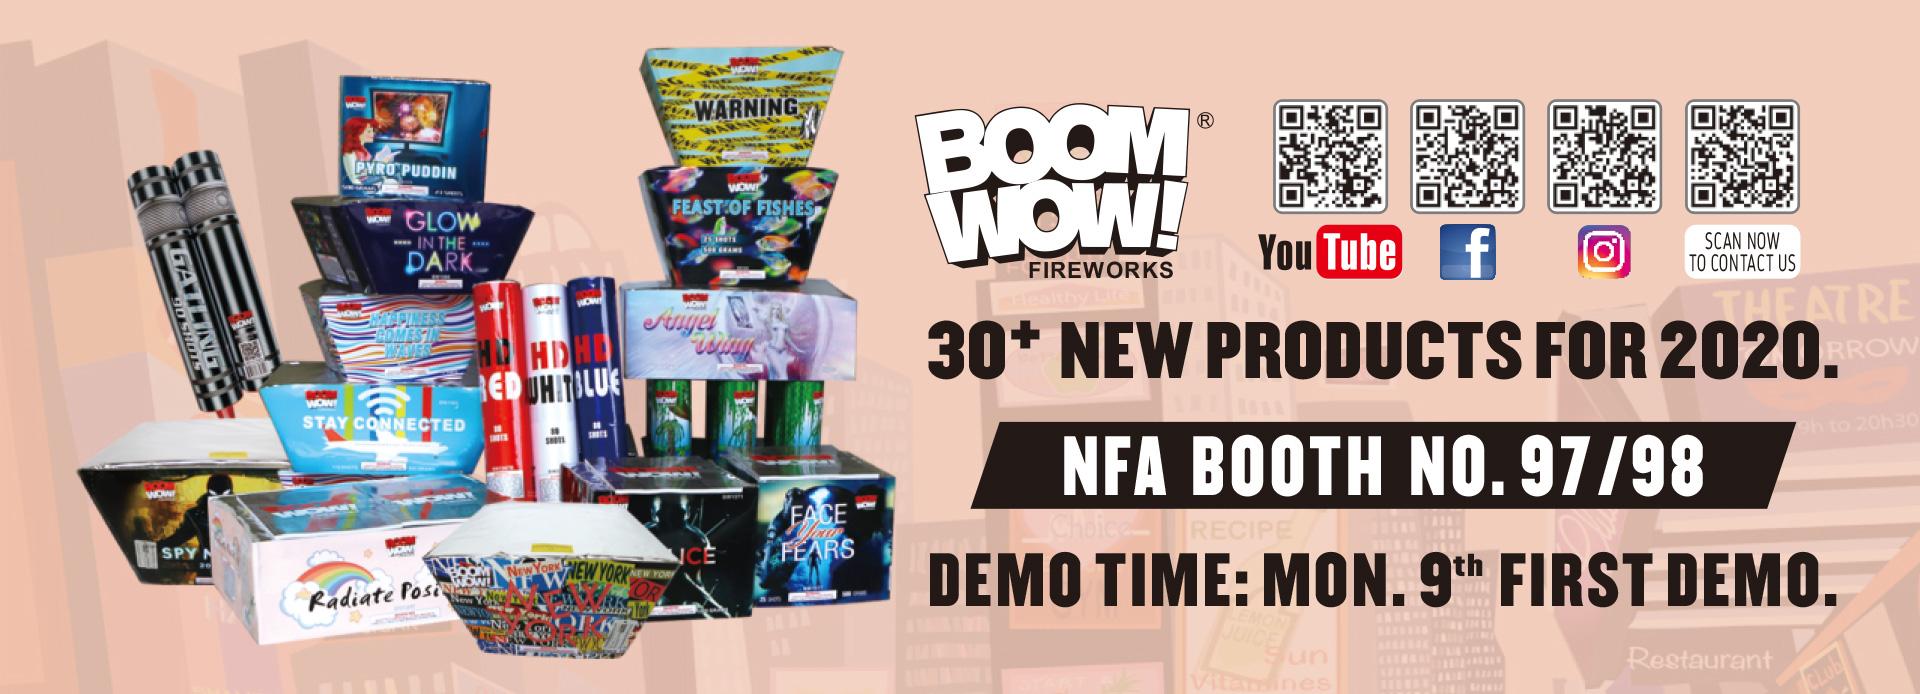 boomwow fireworks